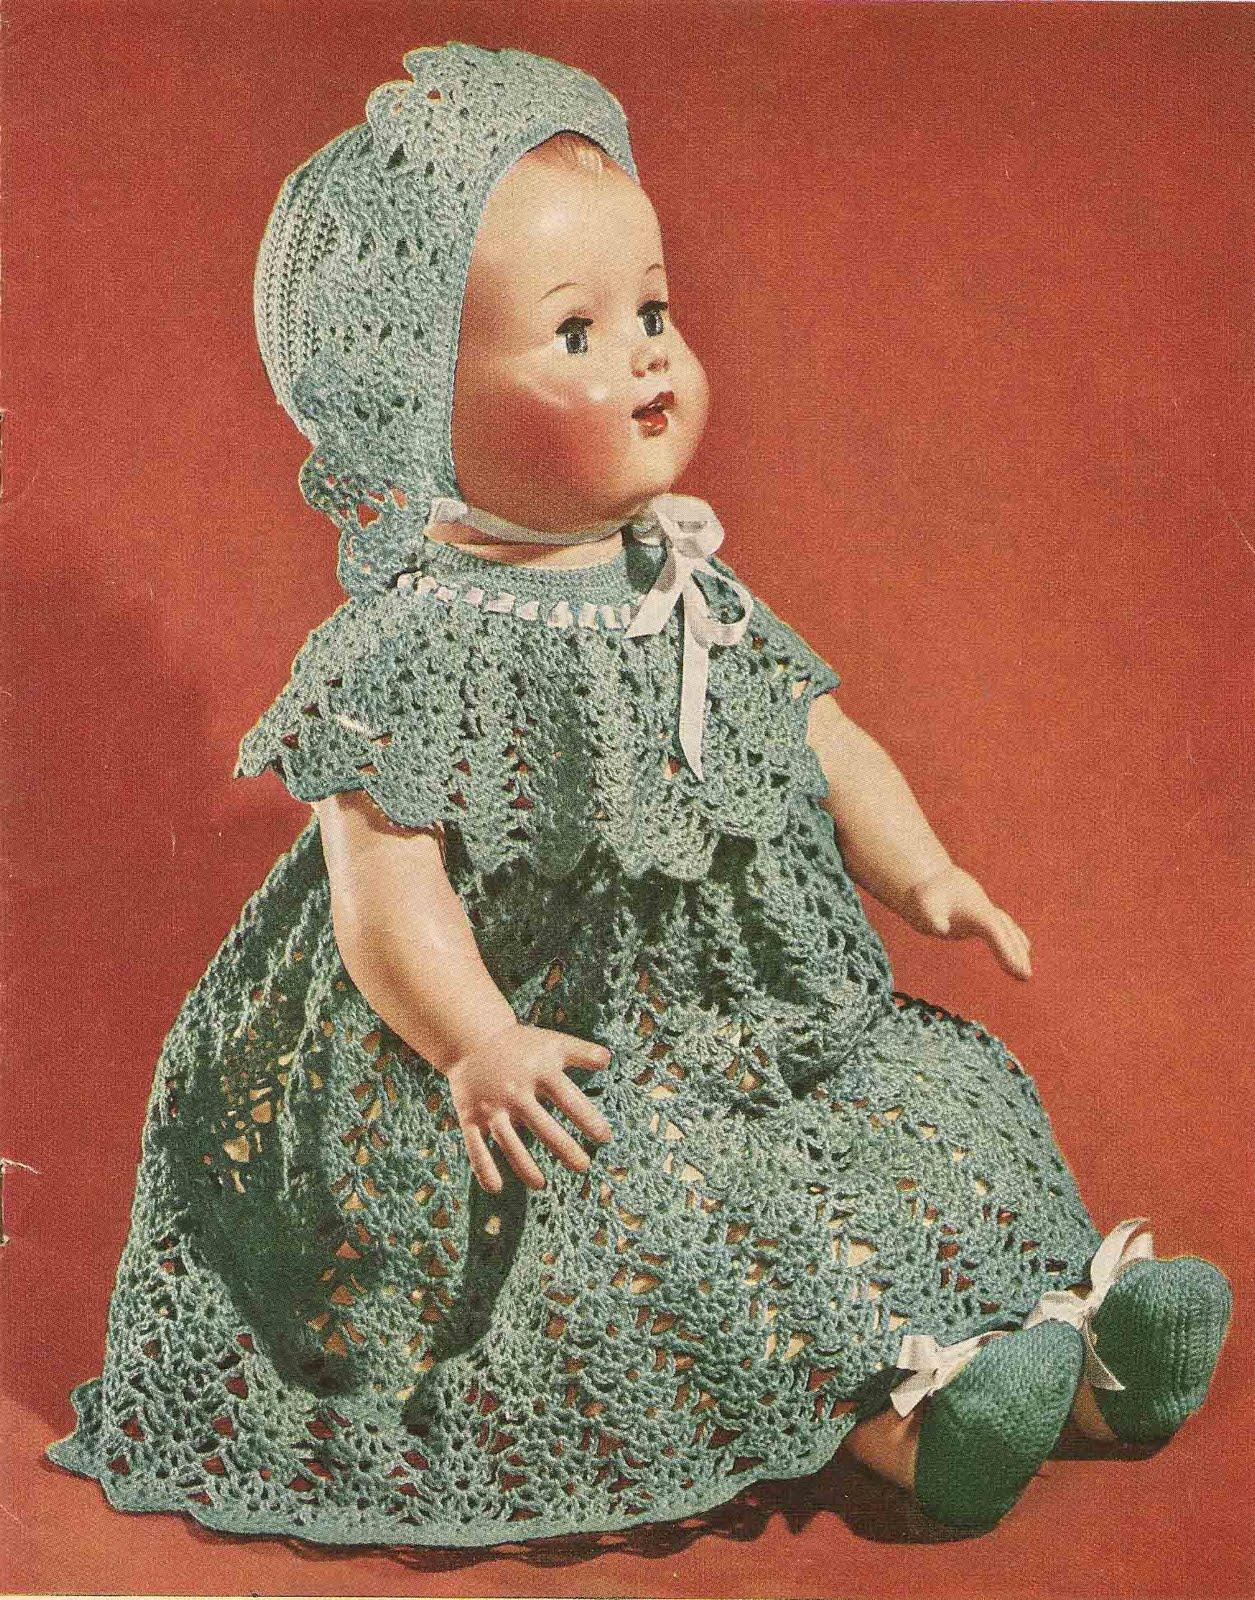 Vintage Knit Crochet Pattern Shop: The Doll Book, Crochet ...